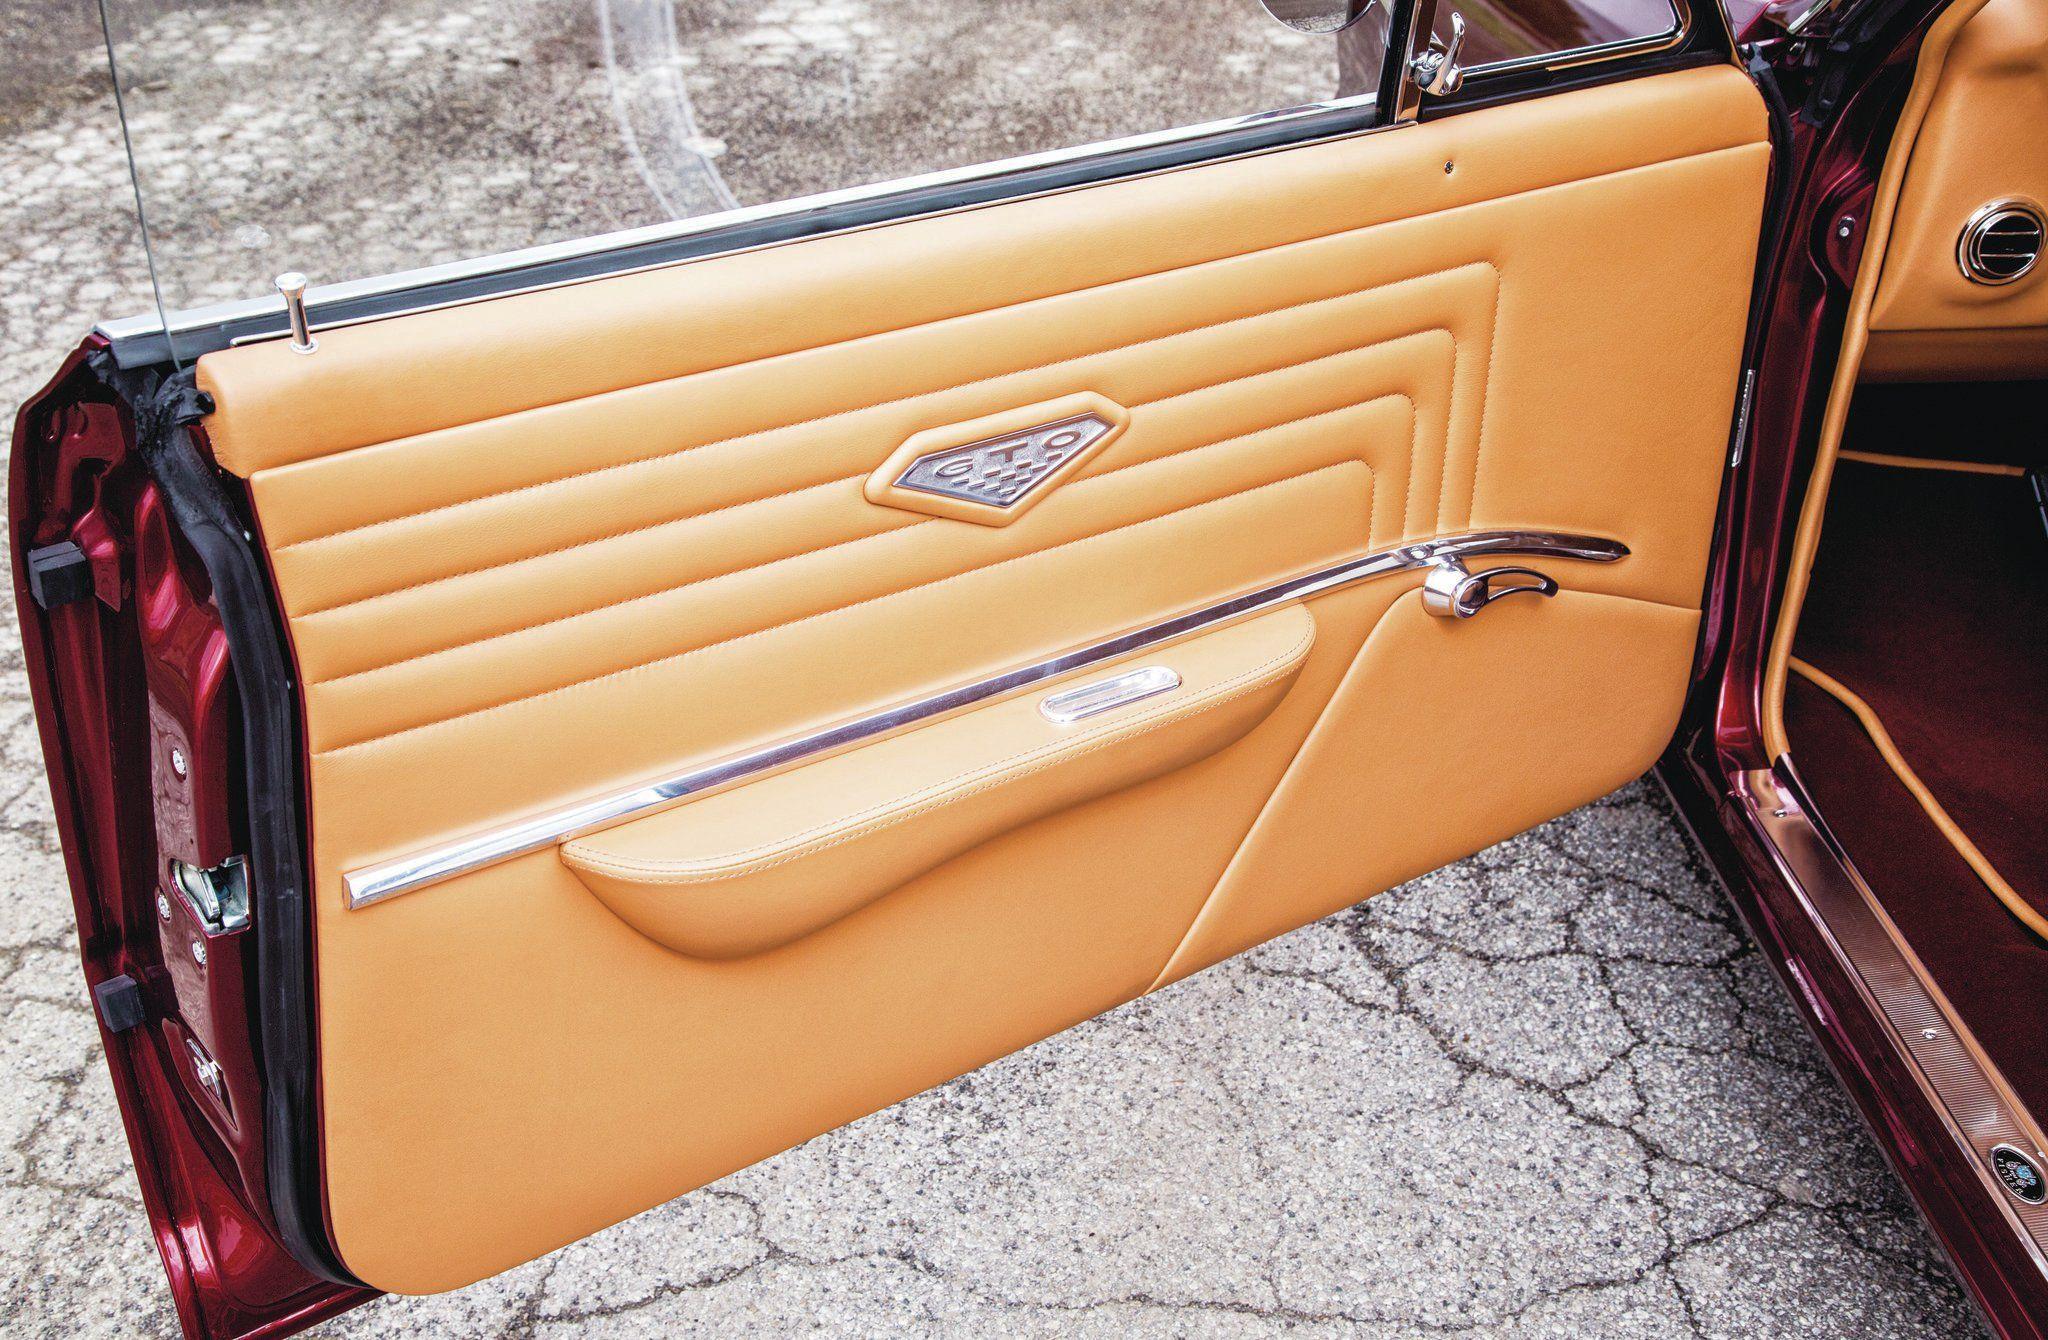 404 Not Found 1965 Pontiac Gto Interior Sliding Barn Doors Pontiac Gto